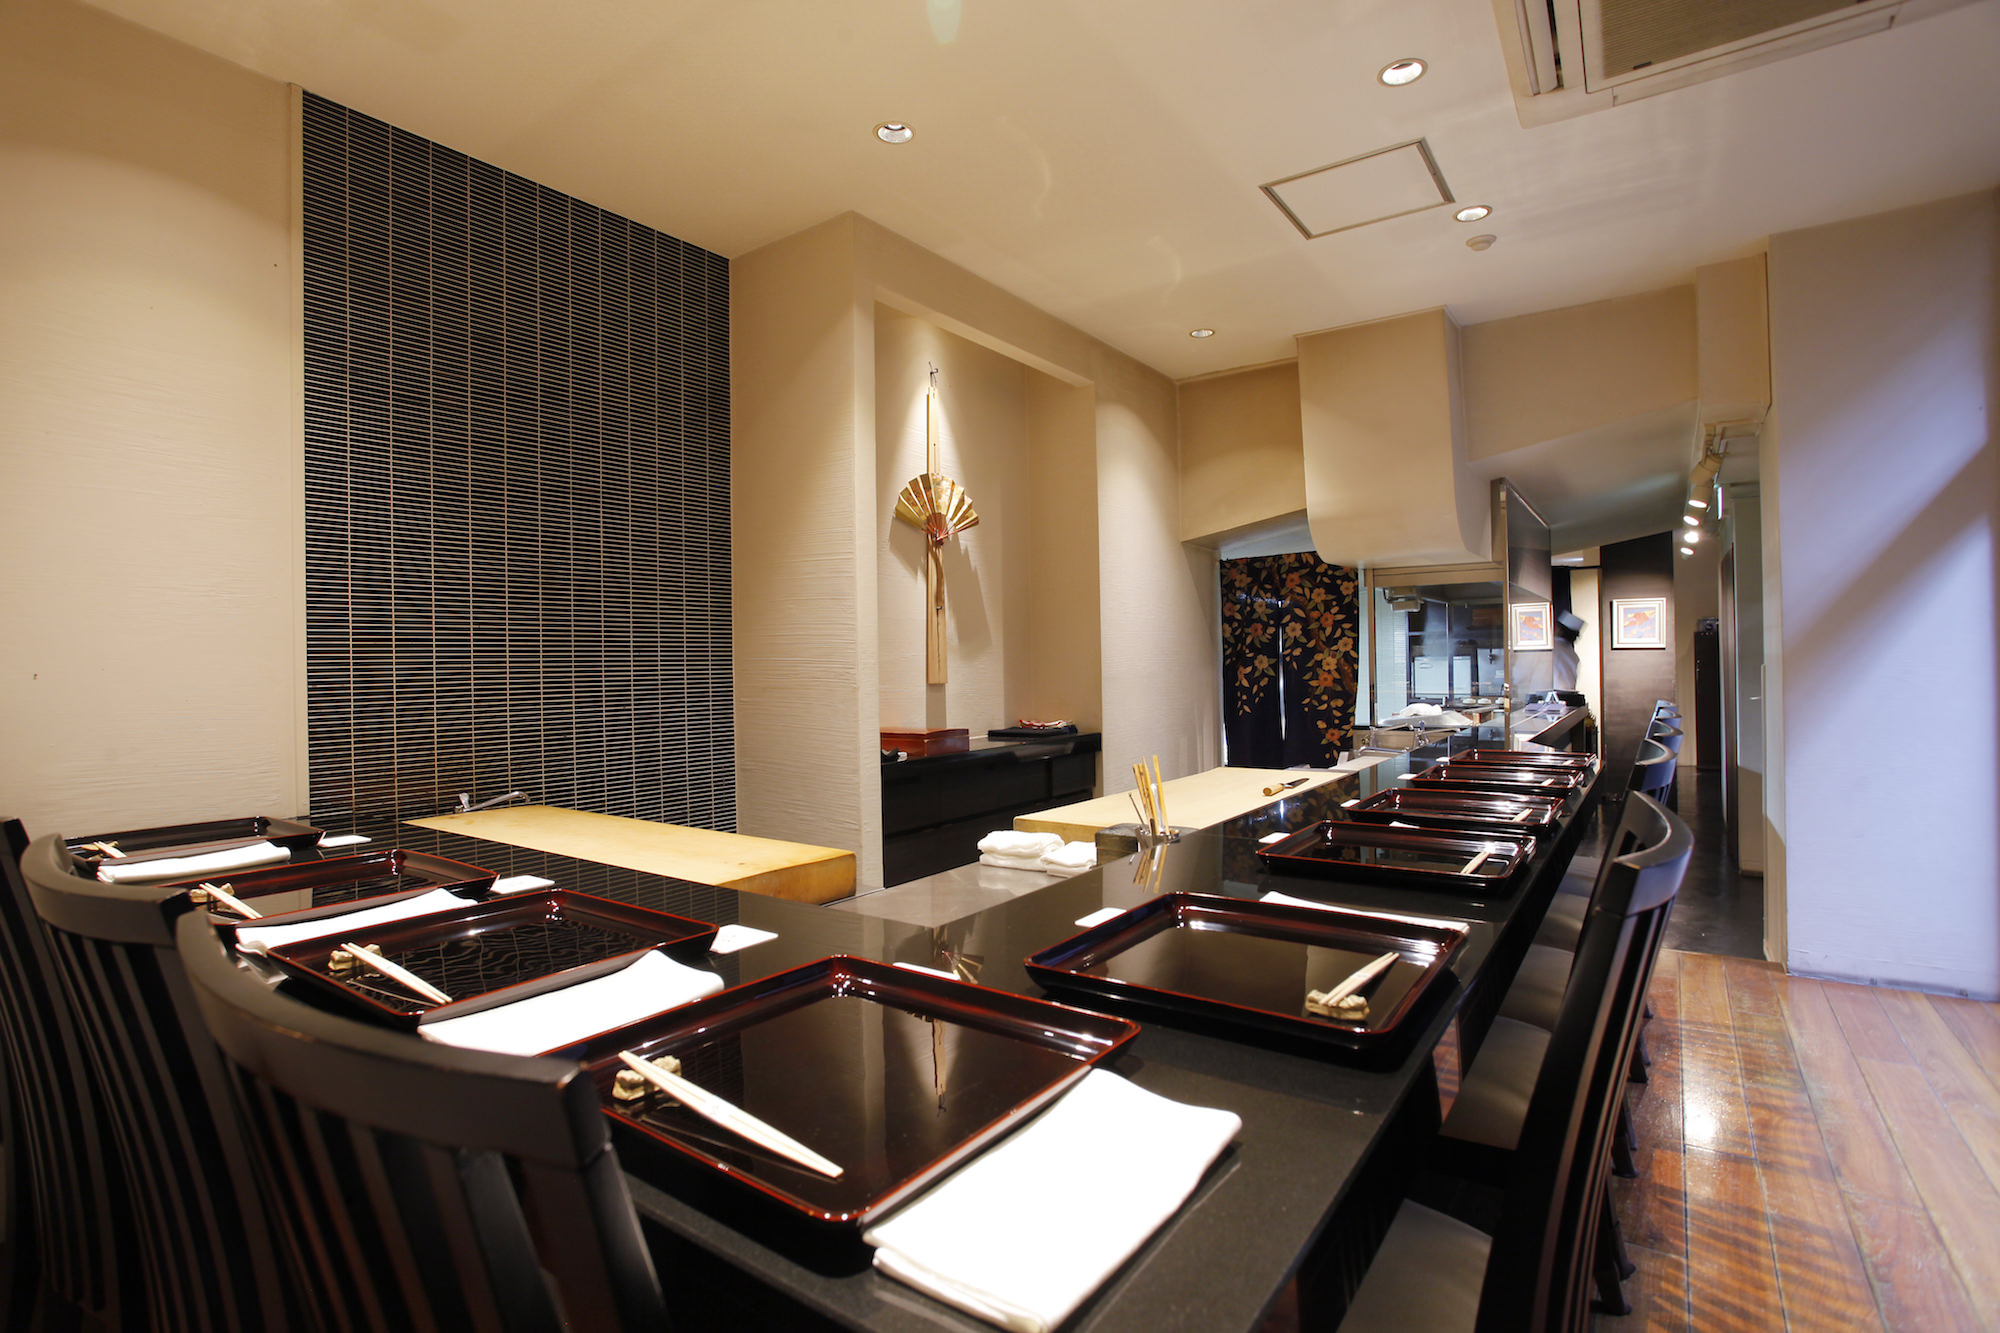 Japanese Cuisin Seizan counter table